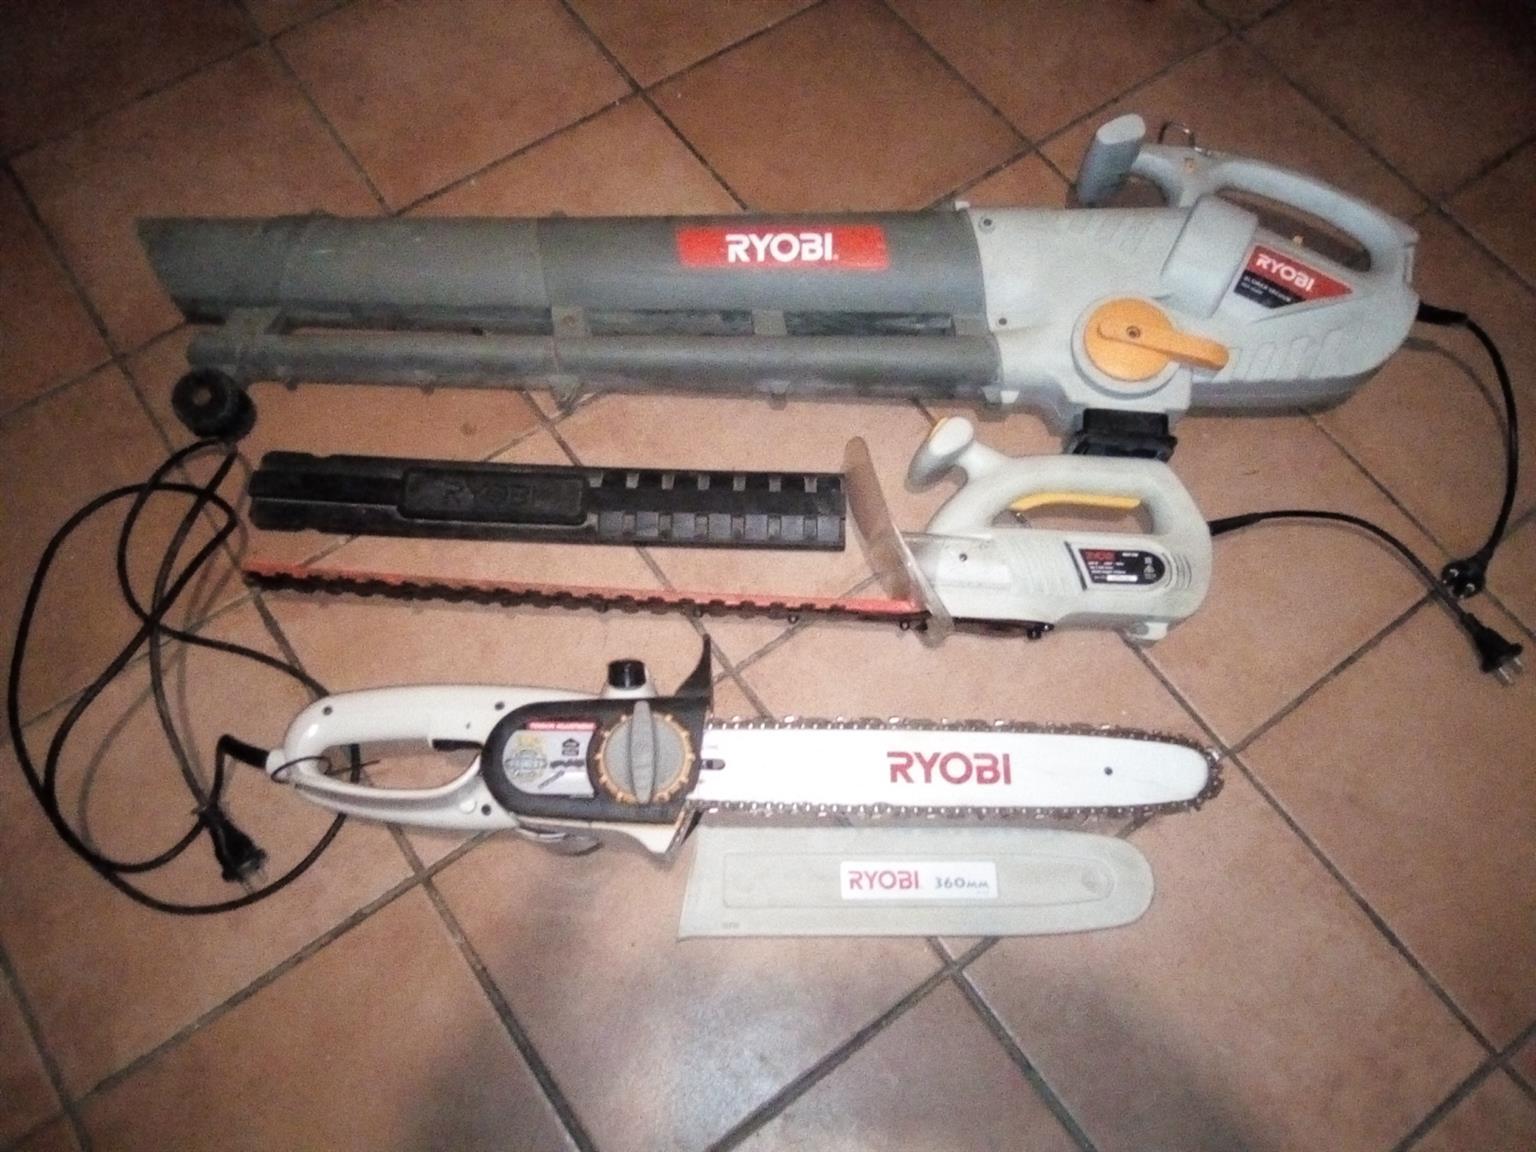 Ryobi Chainsaw elc, Trimmer, Blower